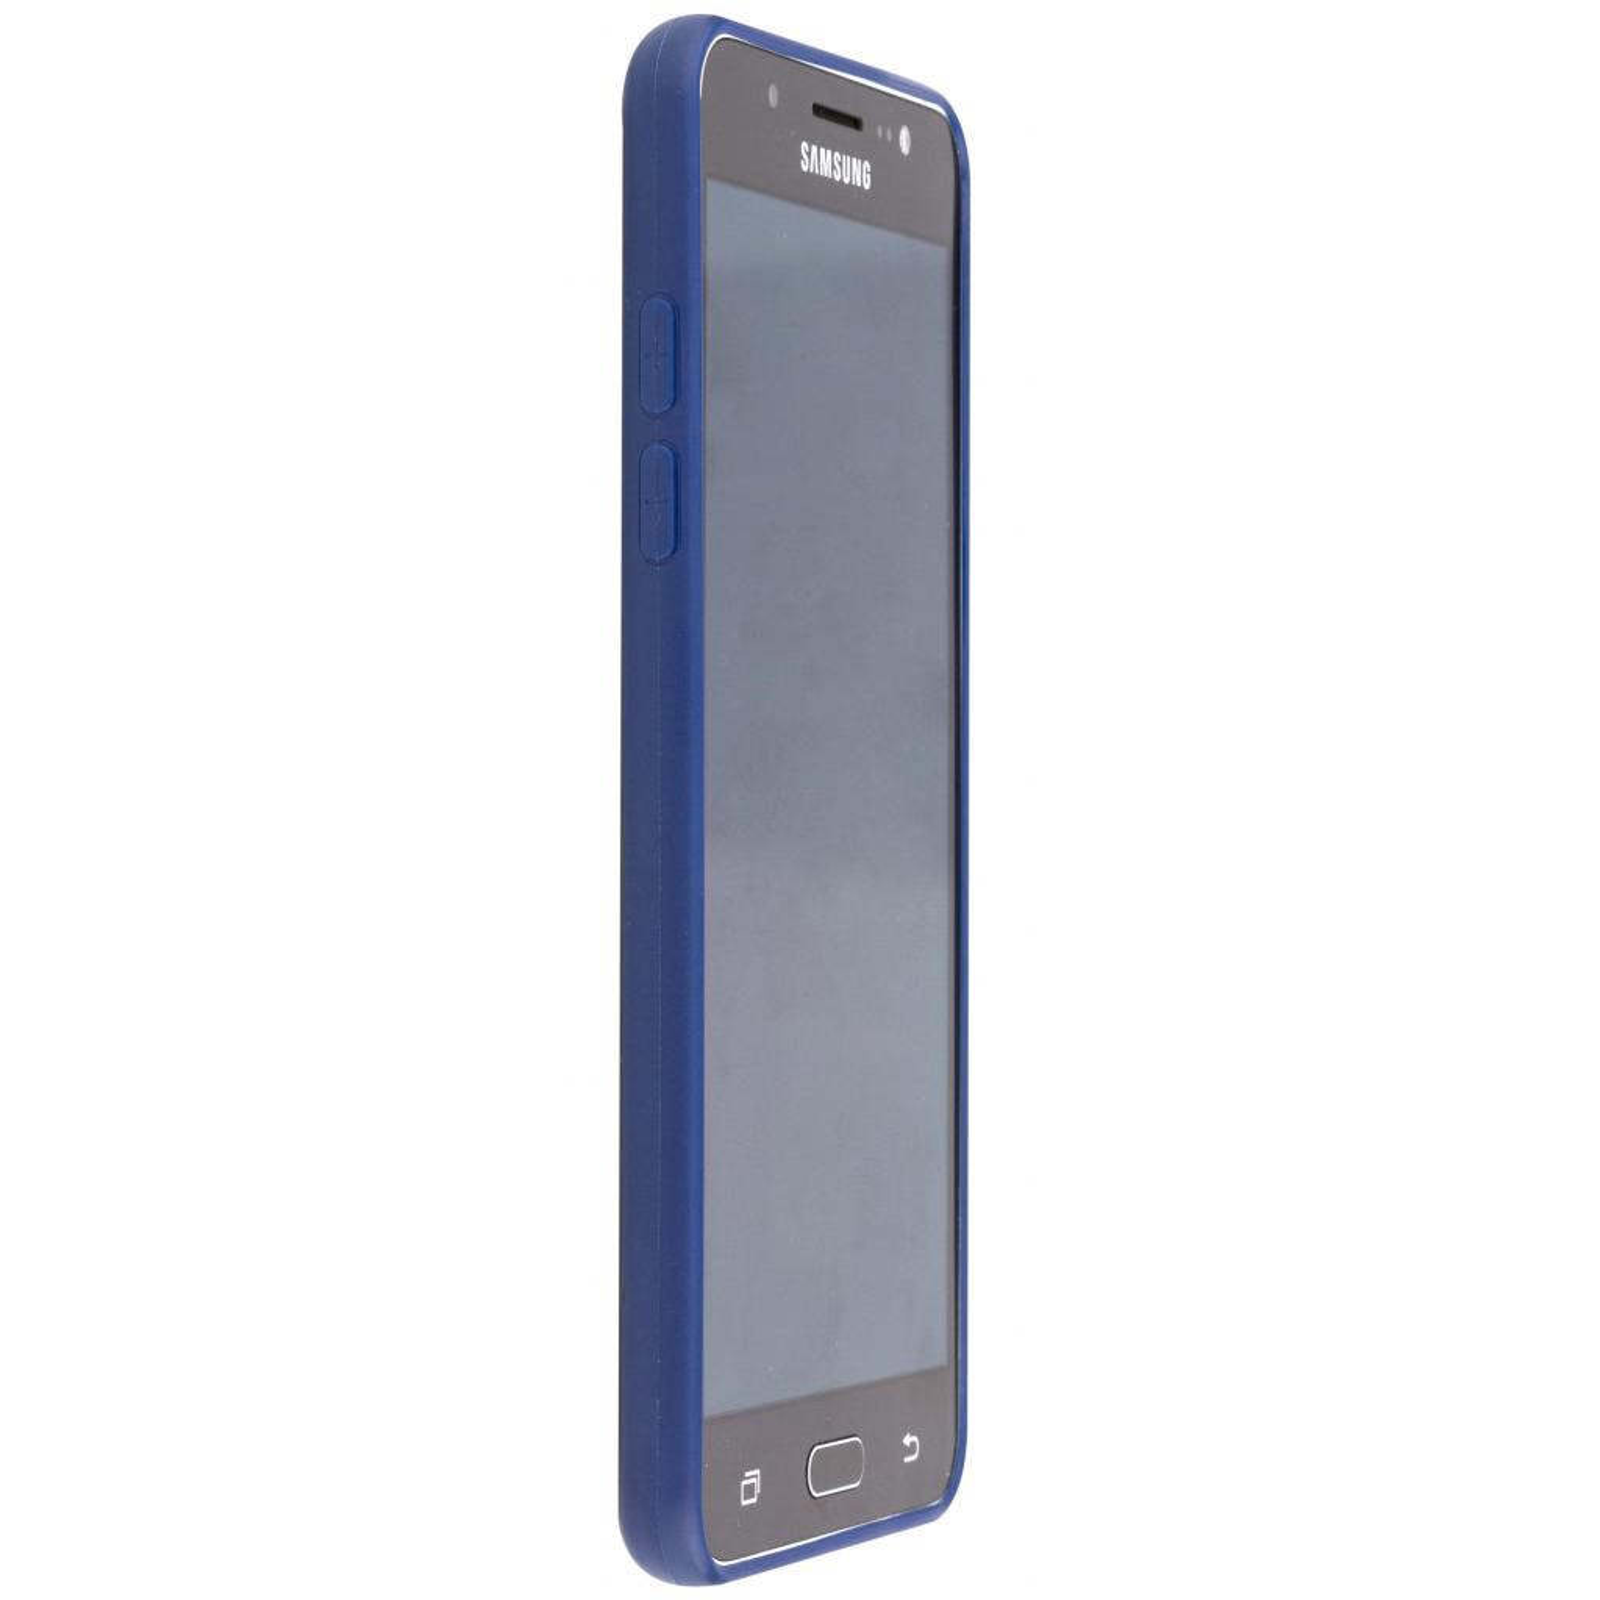 Чехол для моб. телефона MakeFuture Moon Case (TPU) для Samsung J5 2016 (J510) Blue (MCM-SJ510BL) изображение 3